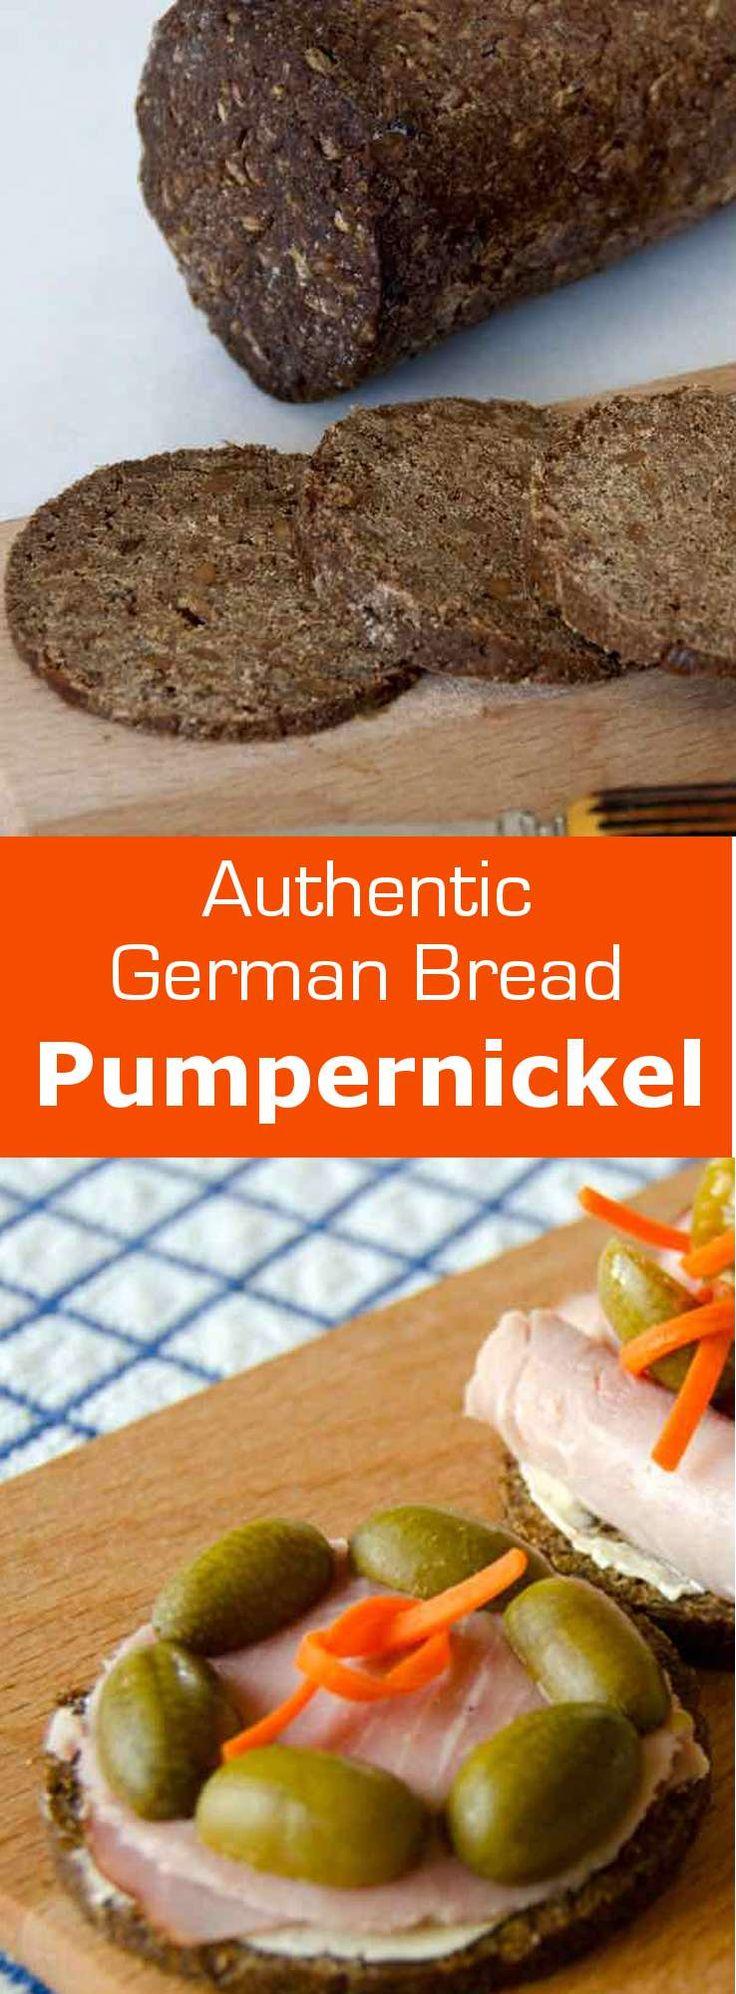 Authentic pumpernickel is a pure rye bread, originally from Westphalia in…